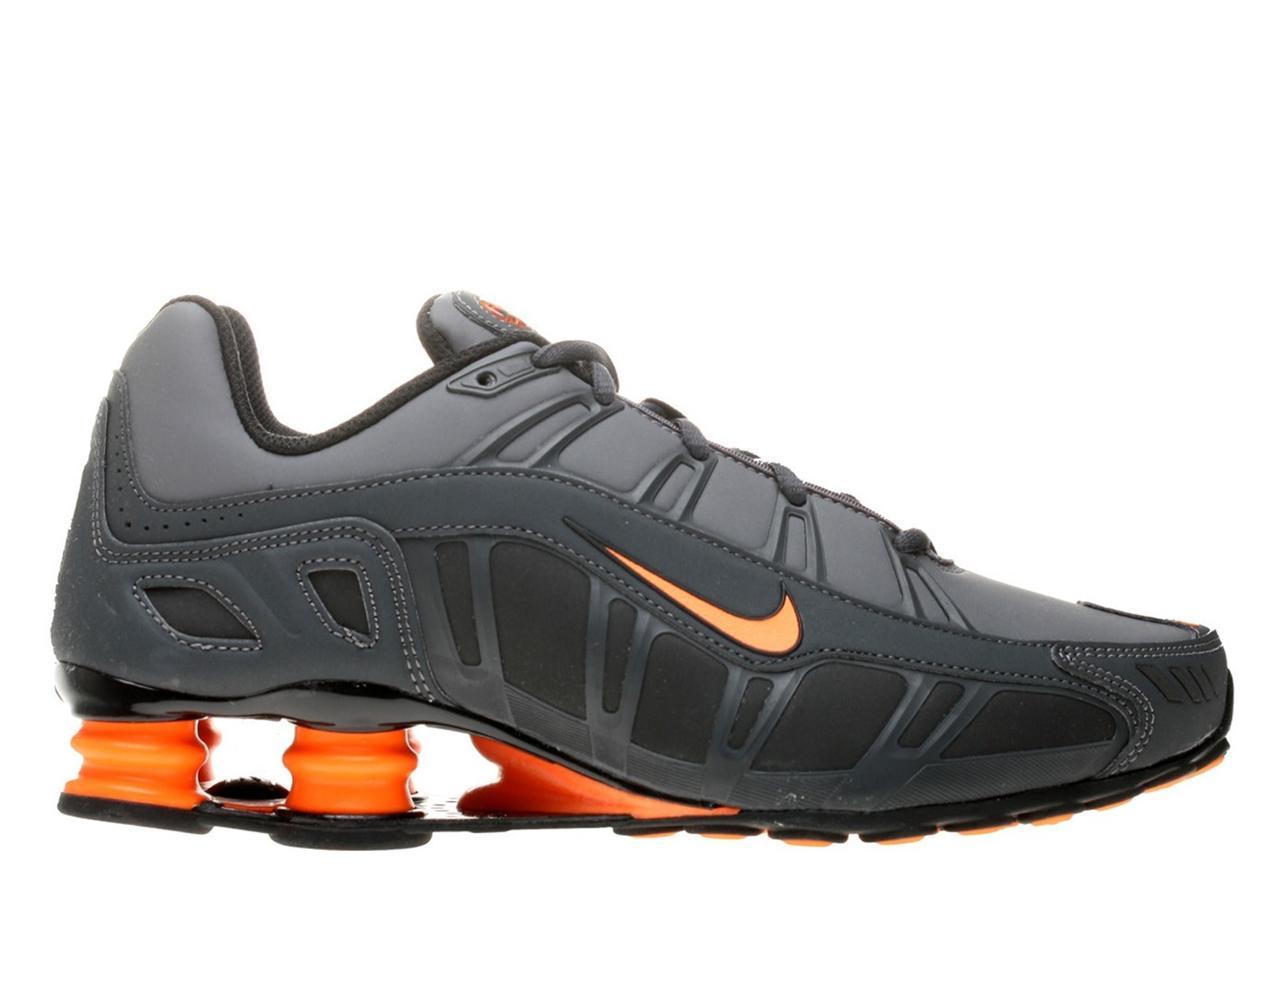 8de0b420663e71 Nike Shox Turbo Livestrong X Nike Air Max 90 Hyperfuse